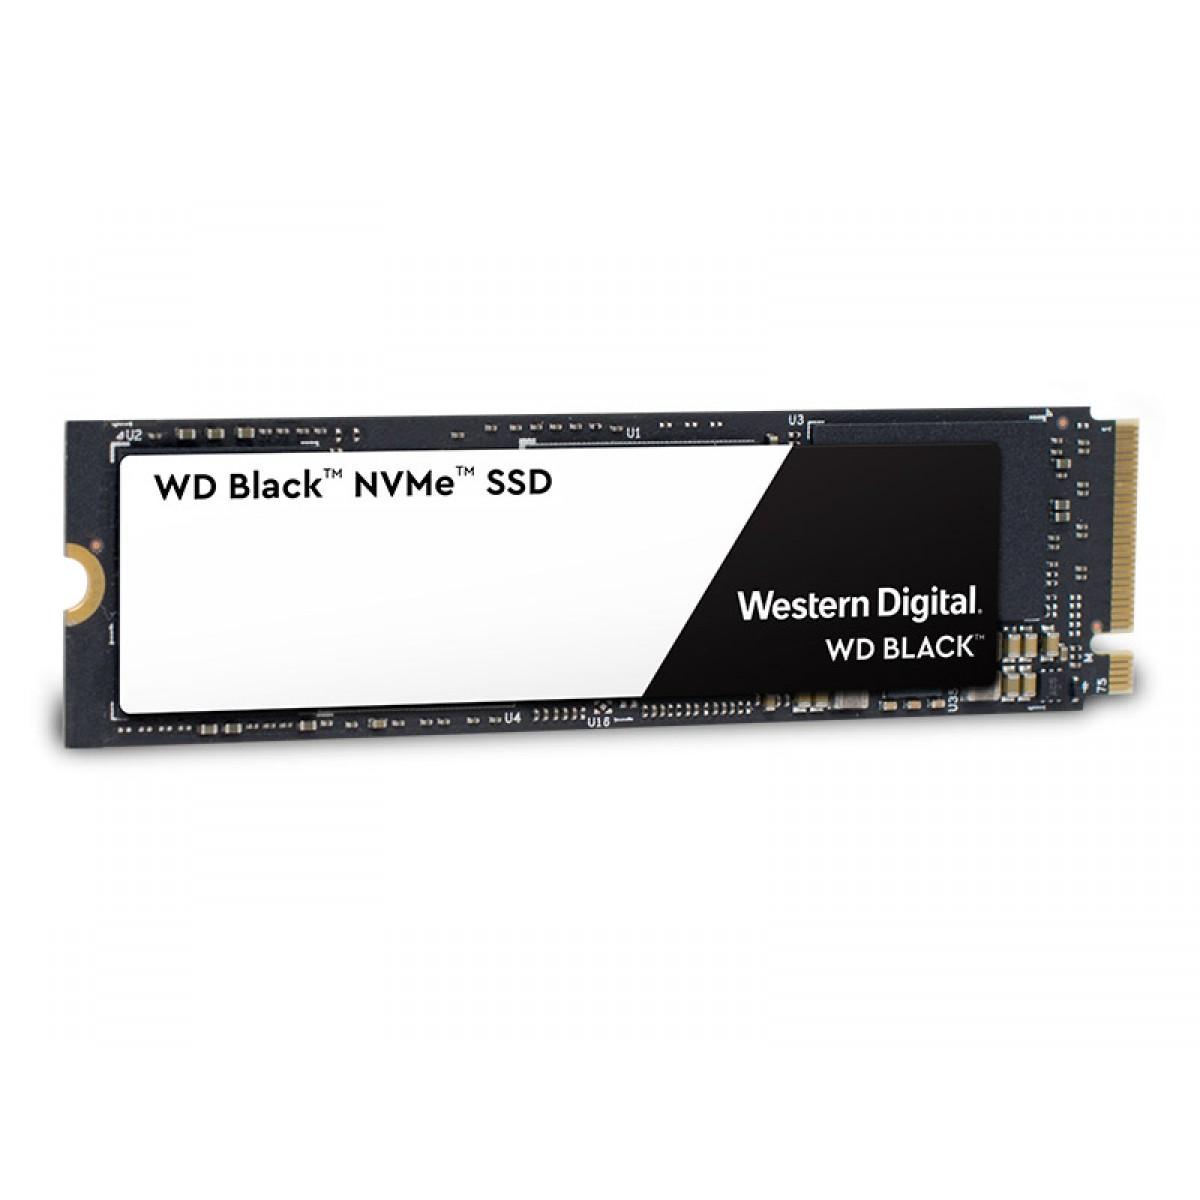 SSD WD Black SN750, 1TB, M.2 2280, NVMe, Leitura 3400MBs e Gravação 28000MBs, WDS100T2X0C